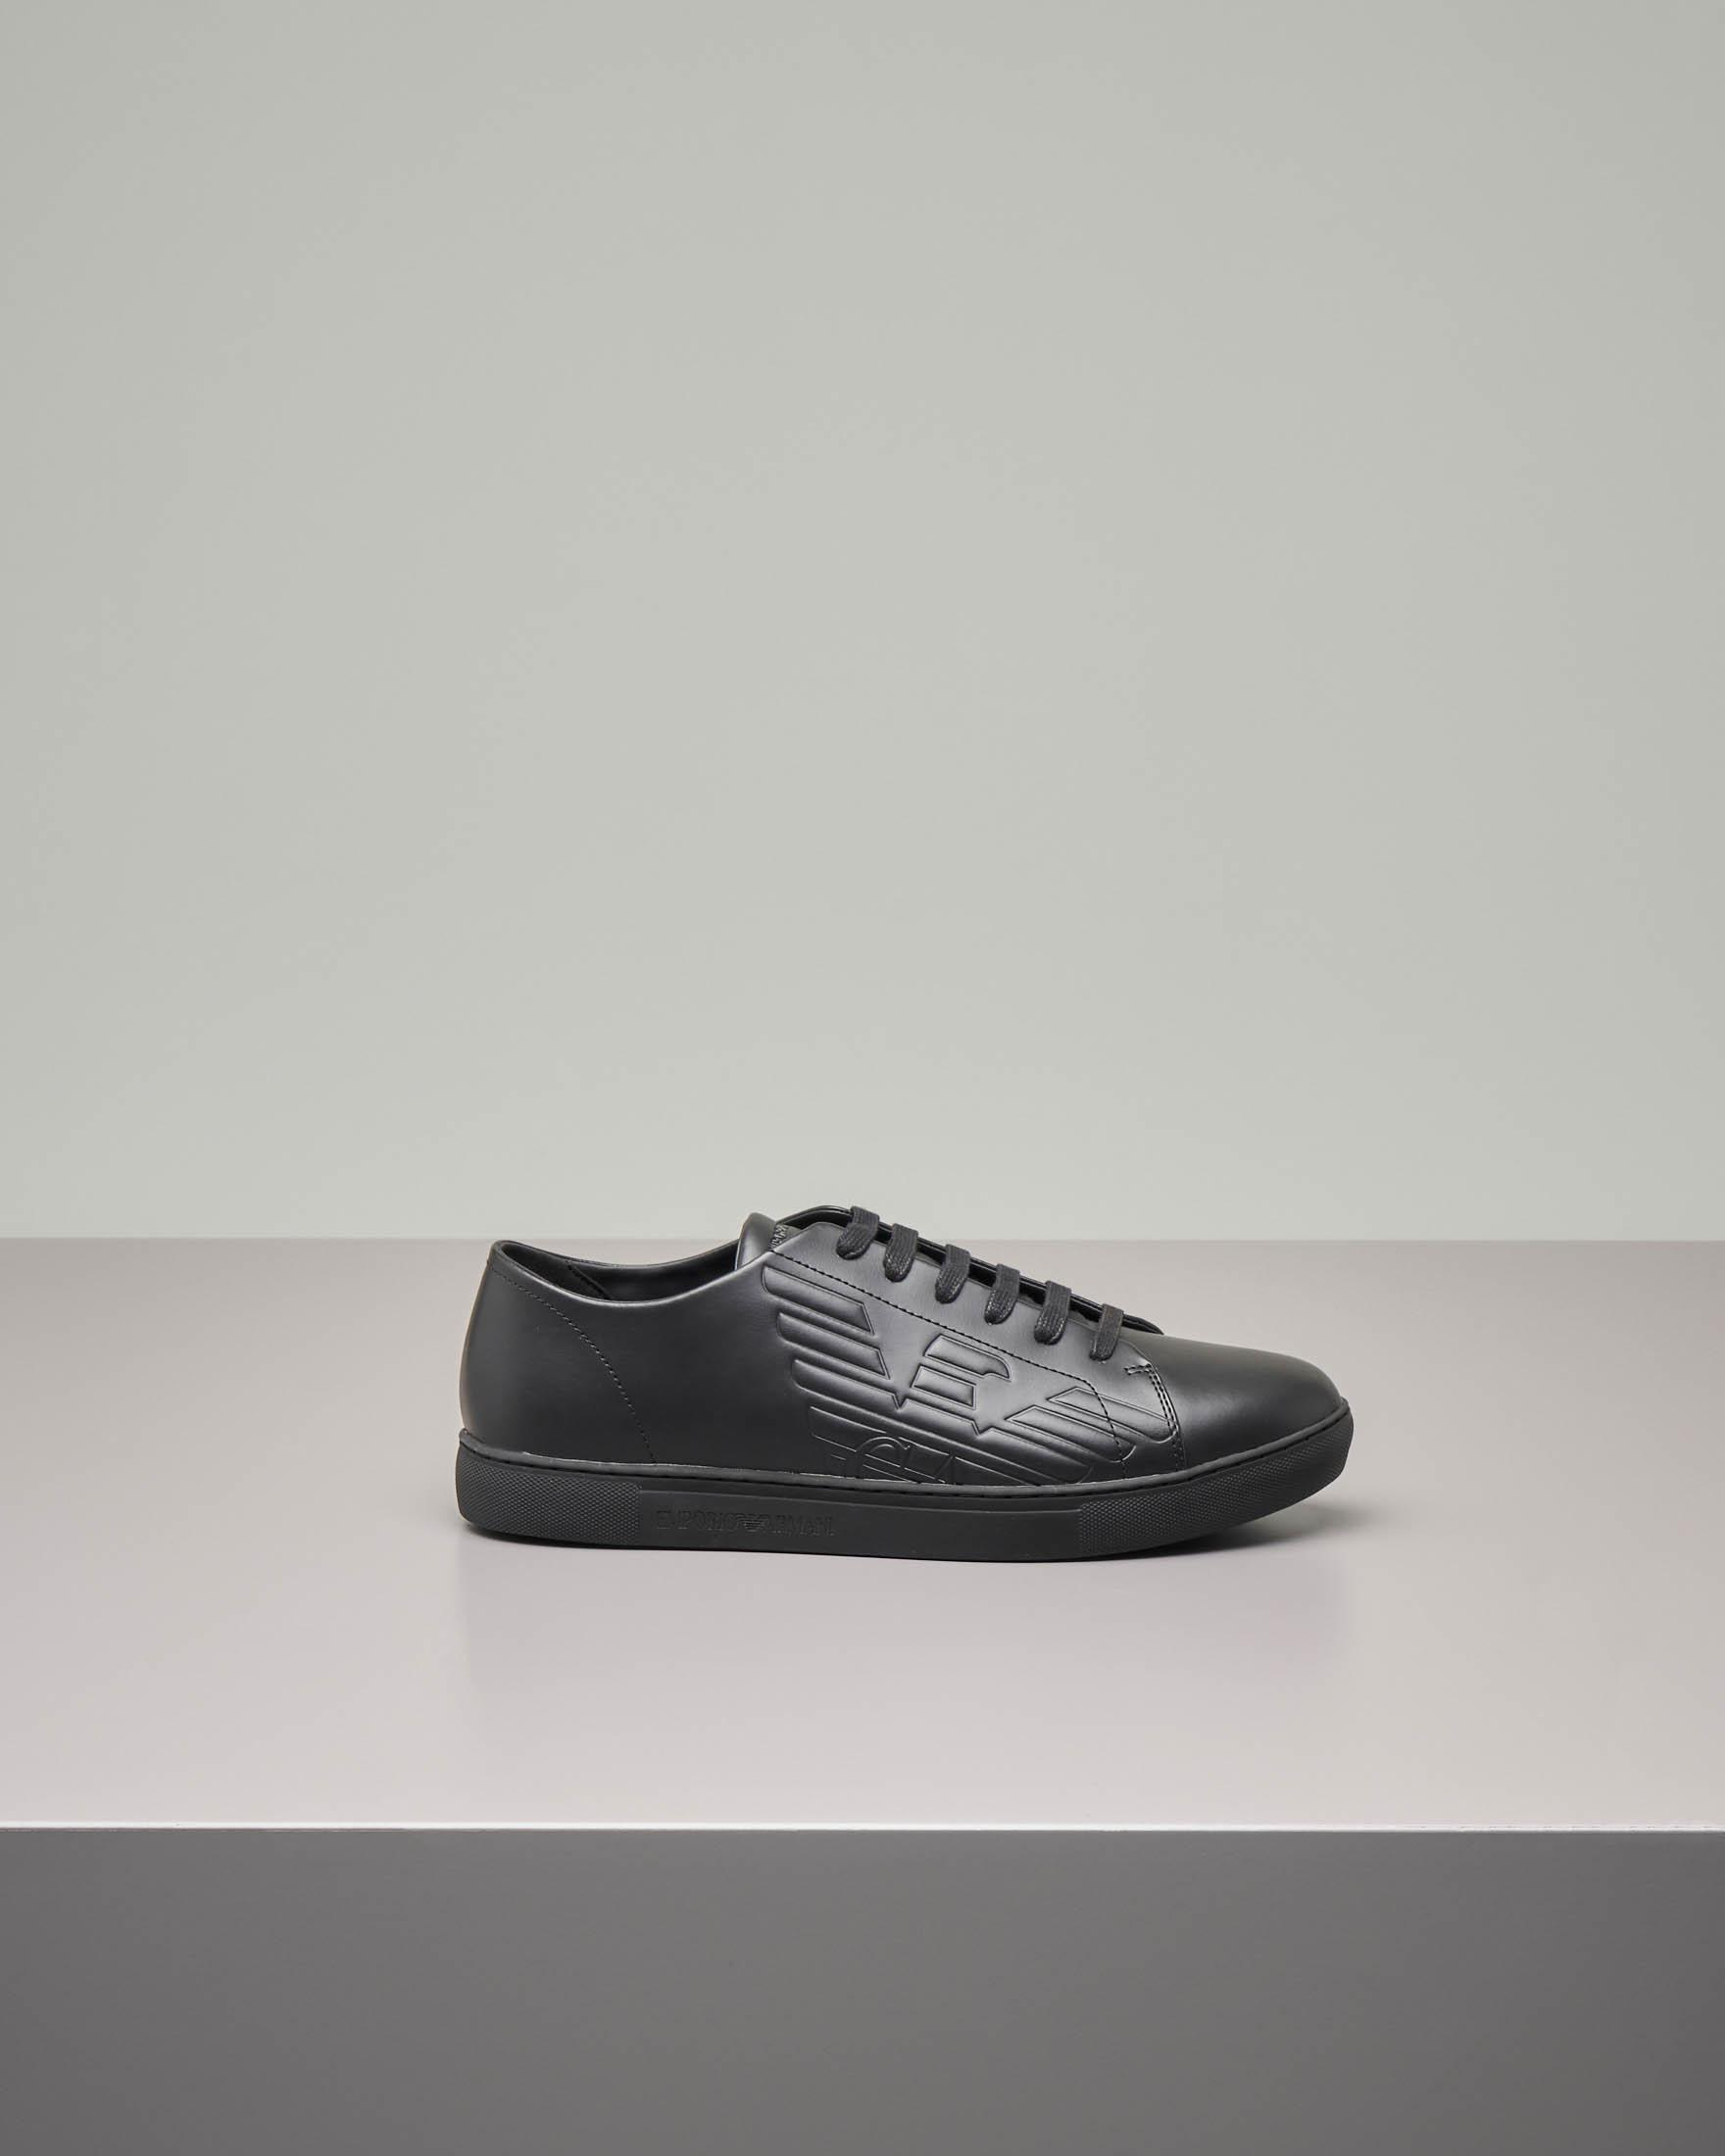 Sneakers nere in pelle con logo aquila in rilievo